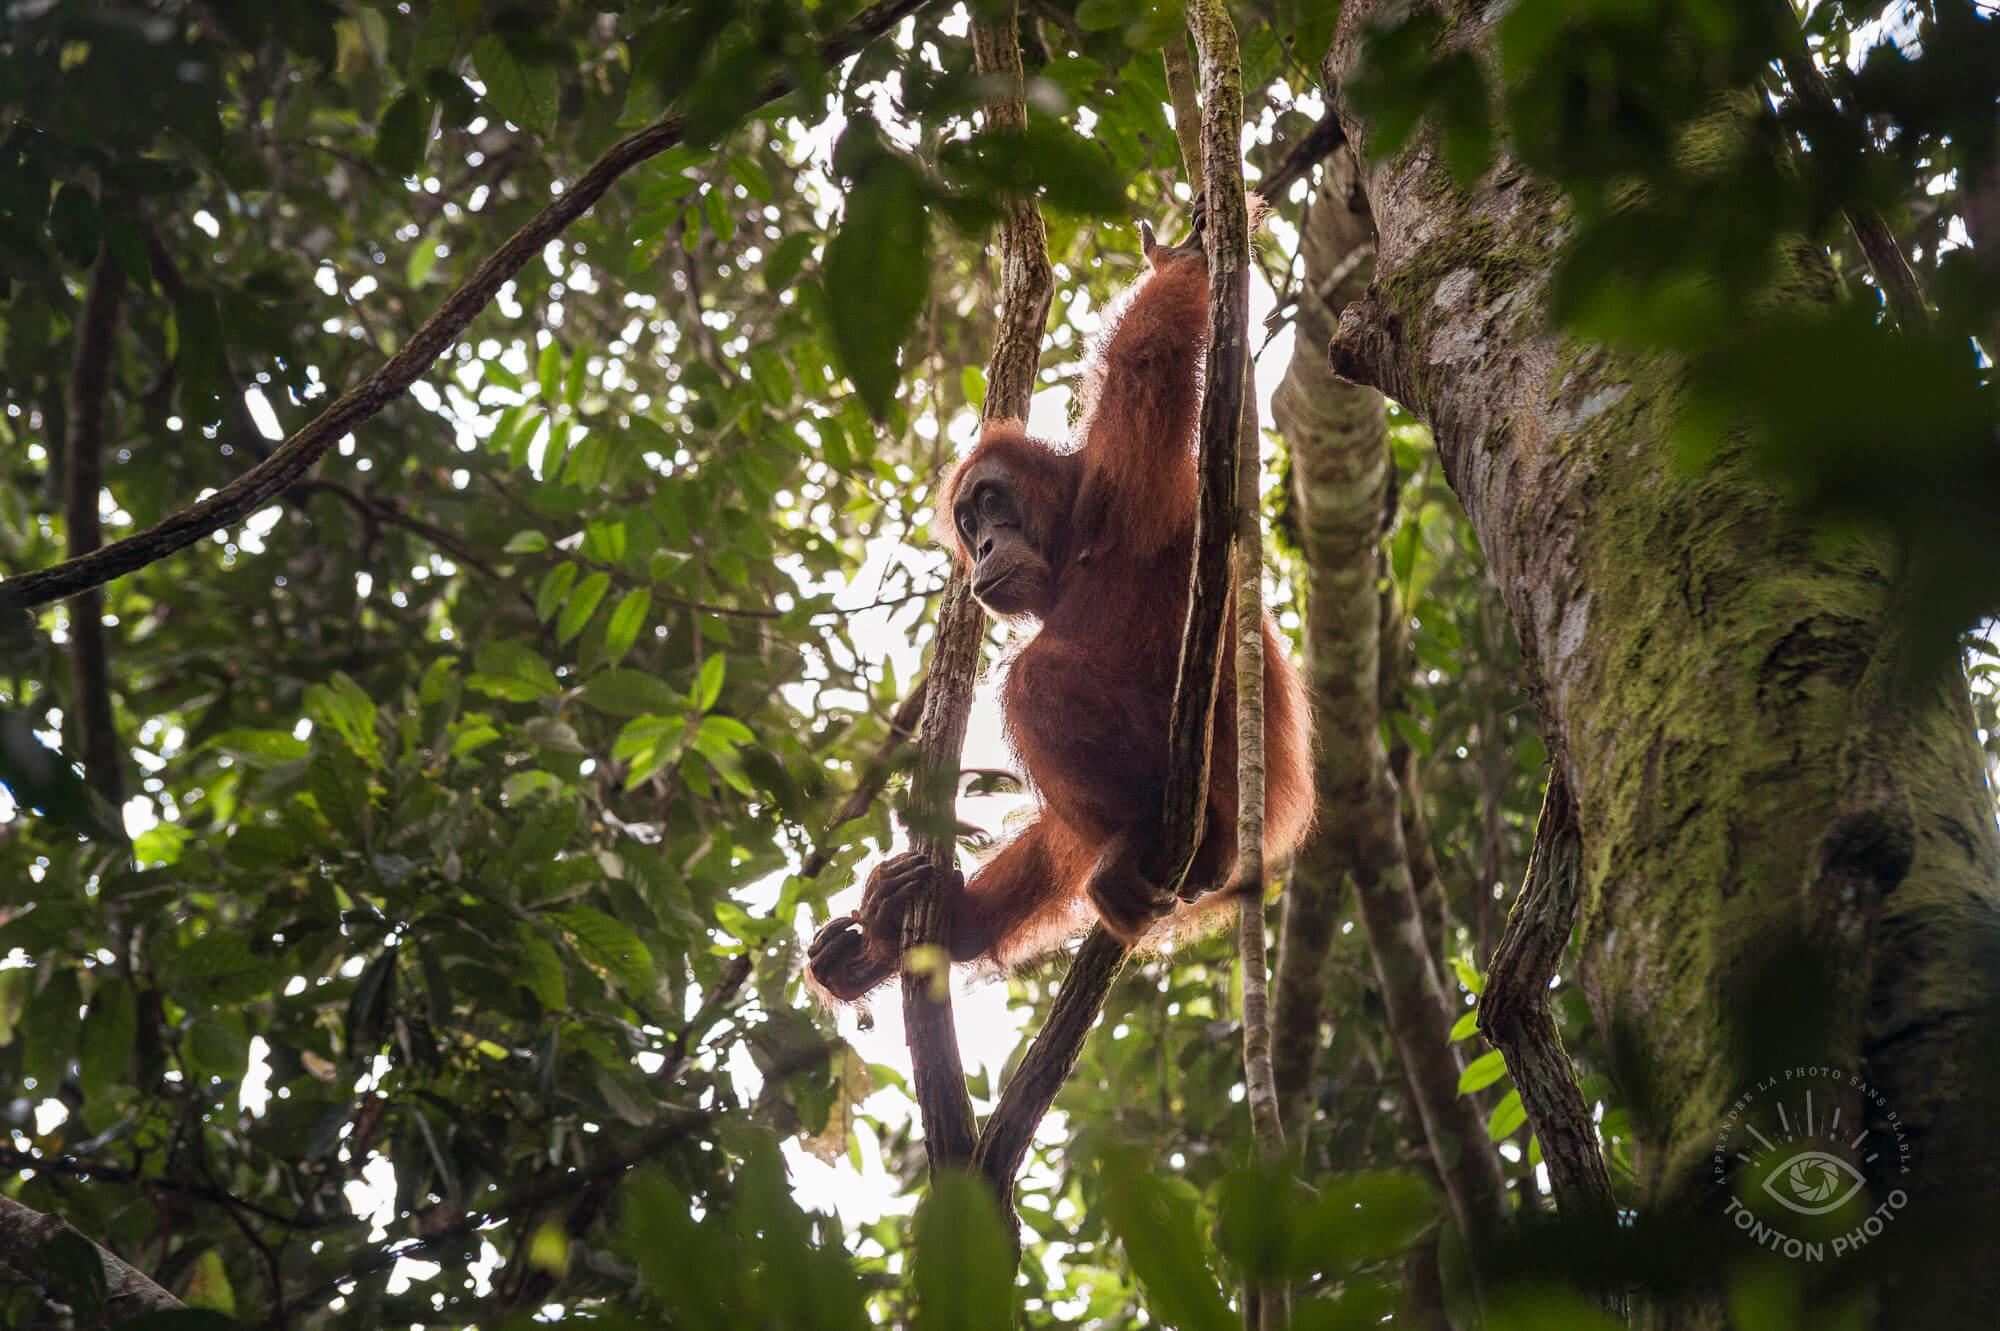 Femelle orang-outan. Parc National du Gunung Leuser, Sumatra, Indonésie © Clément Racineux / Tonton Photo